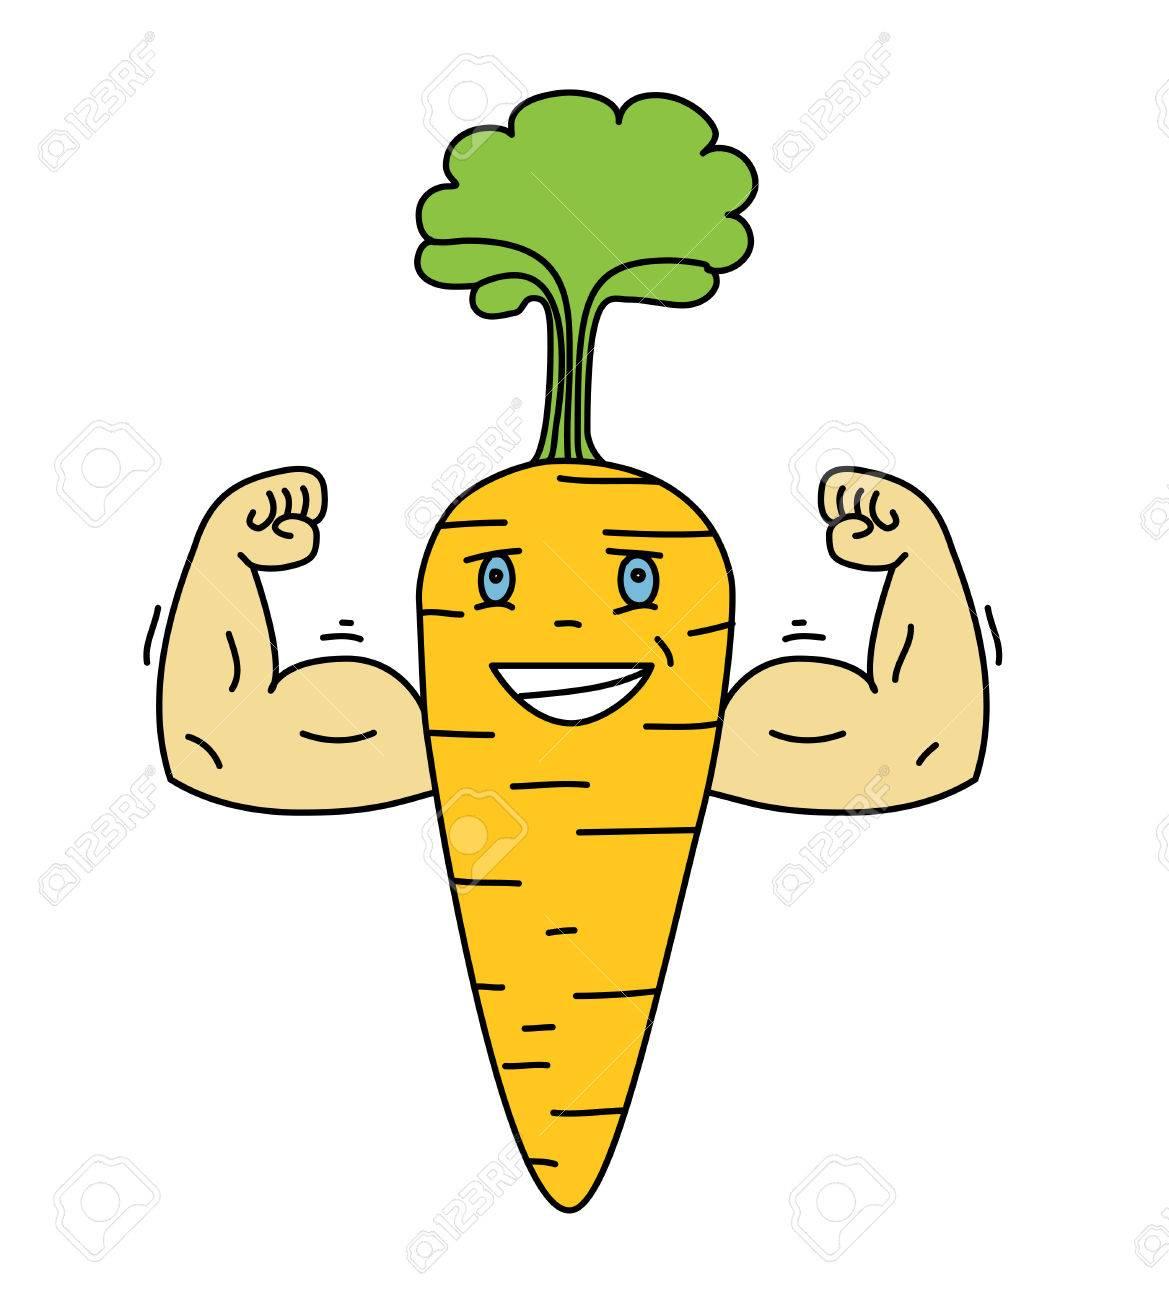 Zanahoria Verduras Animadas – Las zanahorias son raíces comestibles muy ricas en fibra y antioxidantes, con grandes.